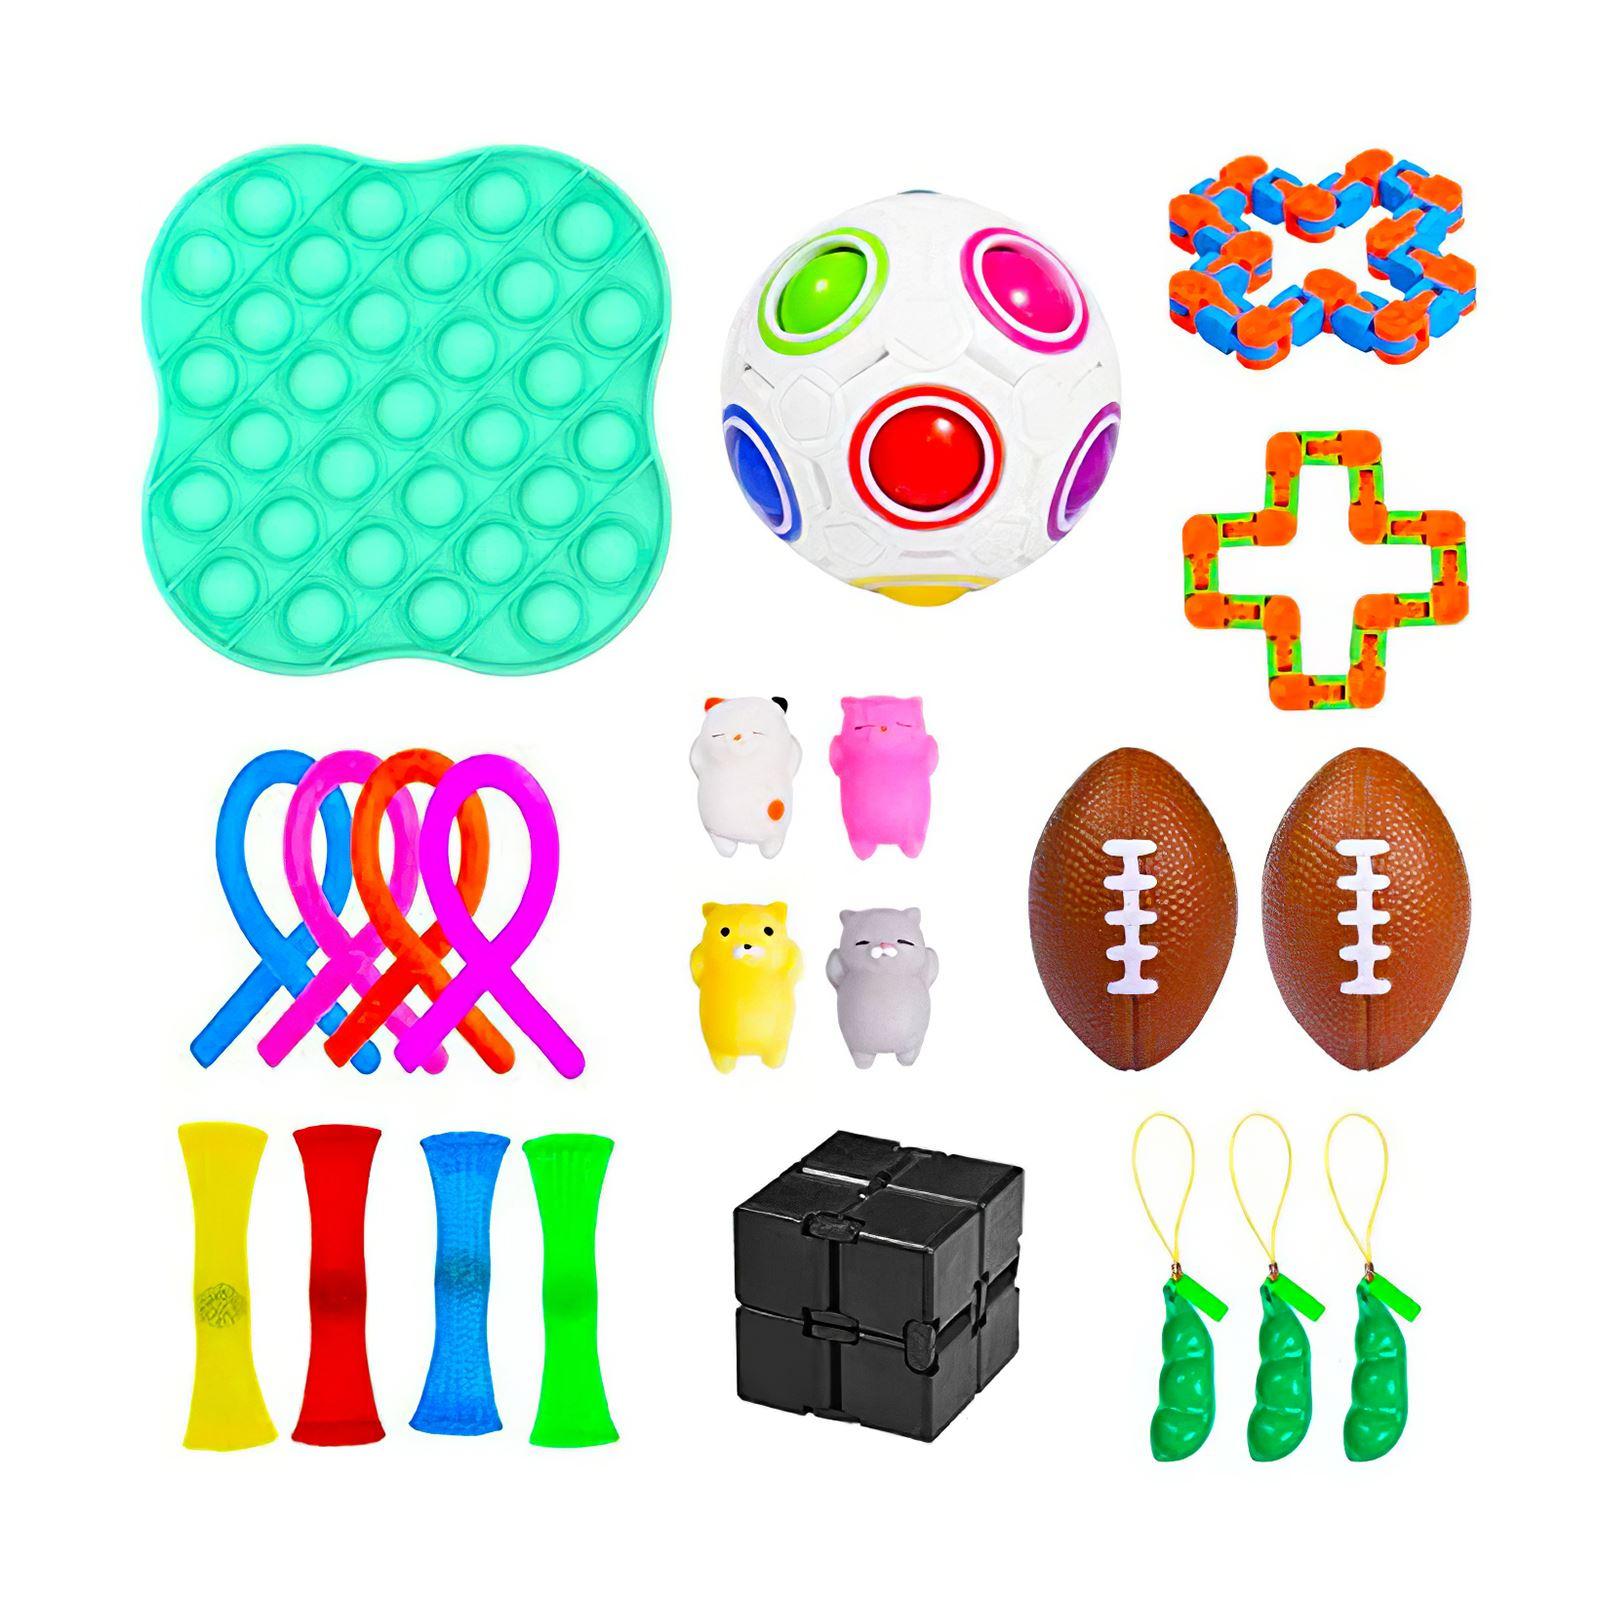 Toy-Kit Sensory-Toy-Set Relief-Toys Fidget-Hand-Toys Autism Stress Decompression Pop img2